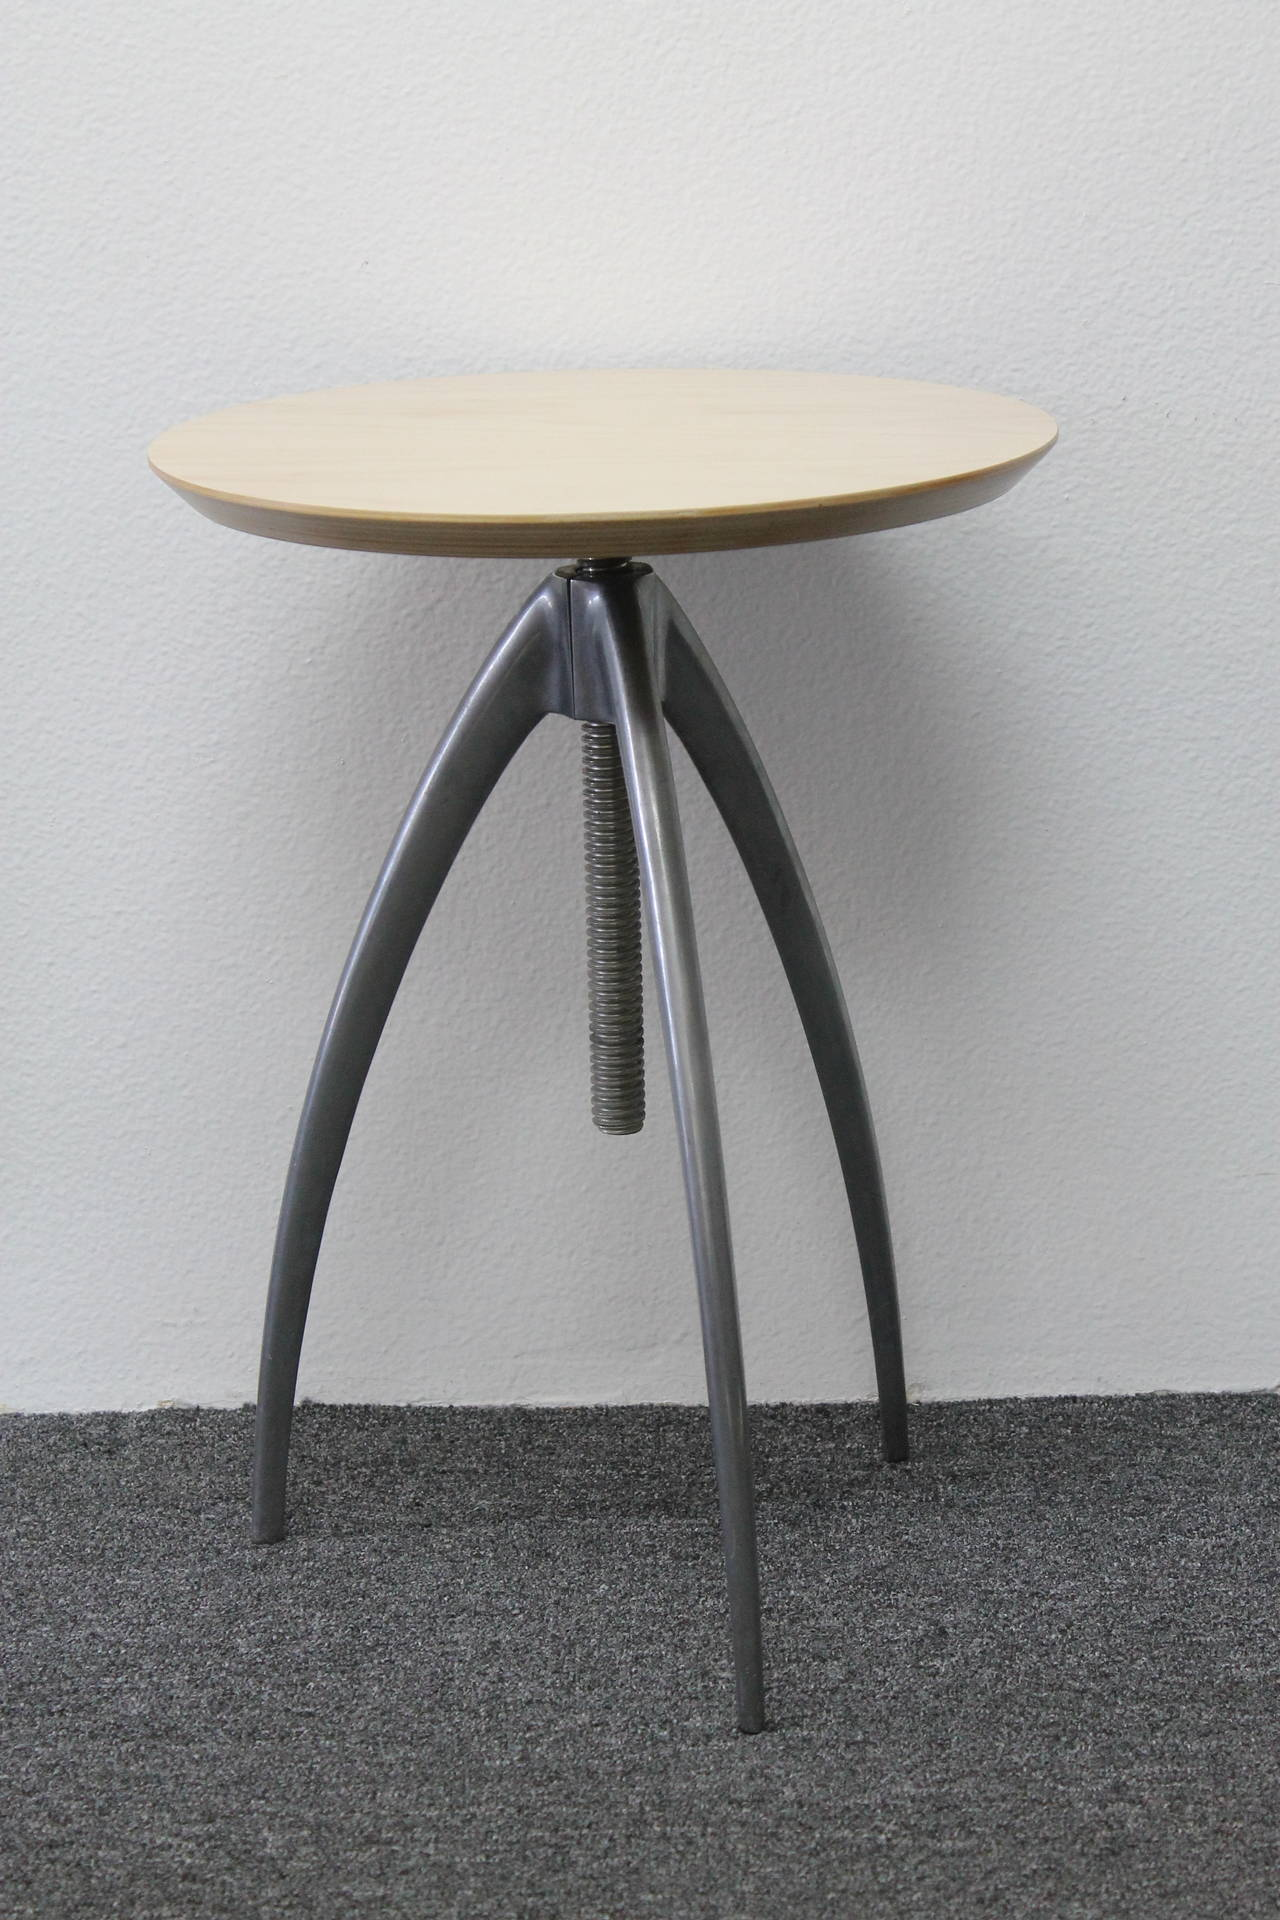 philippe starck aleph stool at 1stdibs. Black Bedroom Furniture Sets. Home Design Ideas